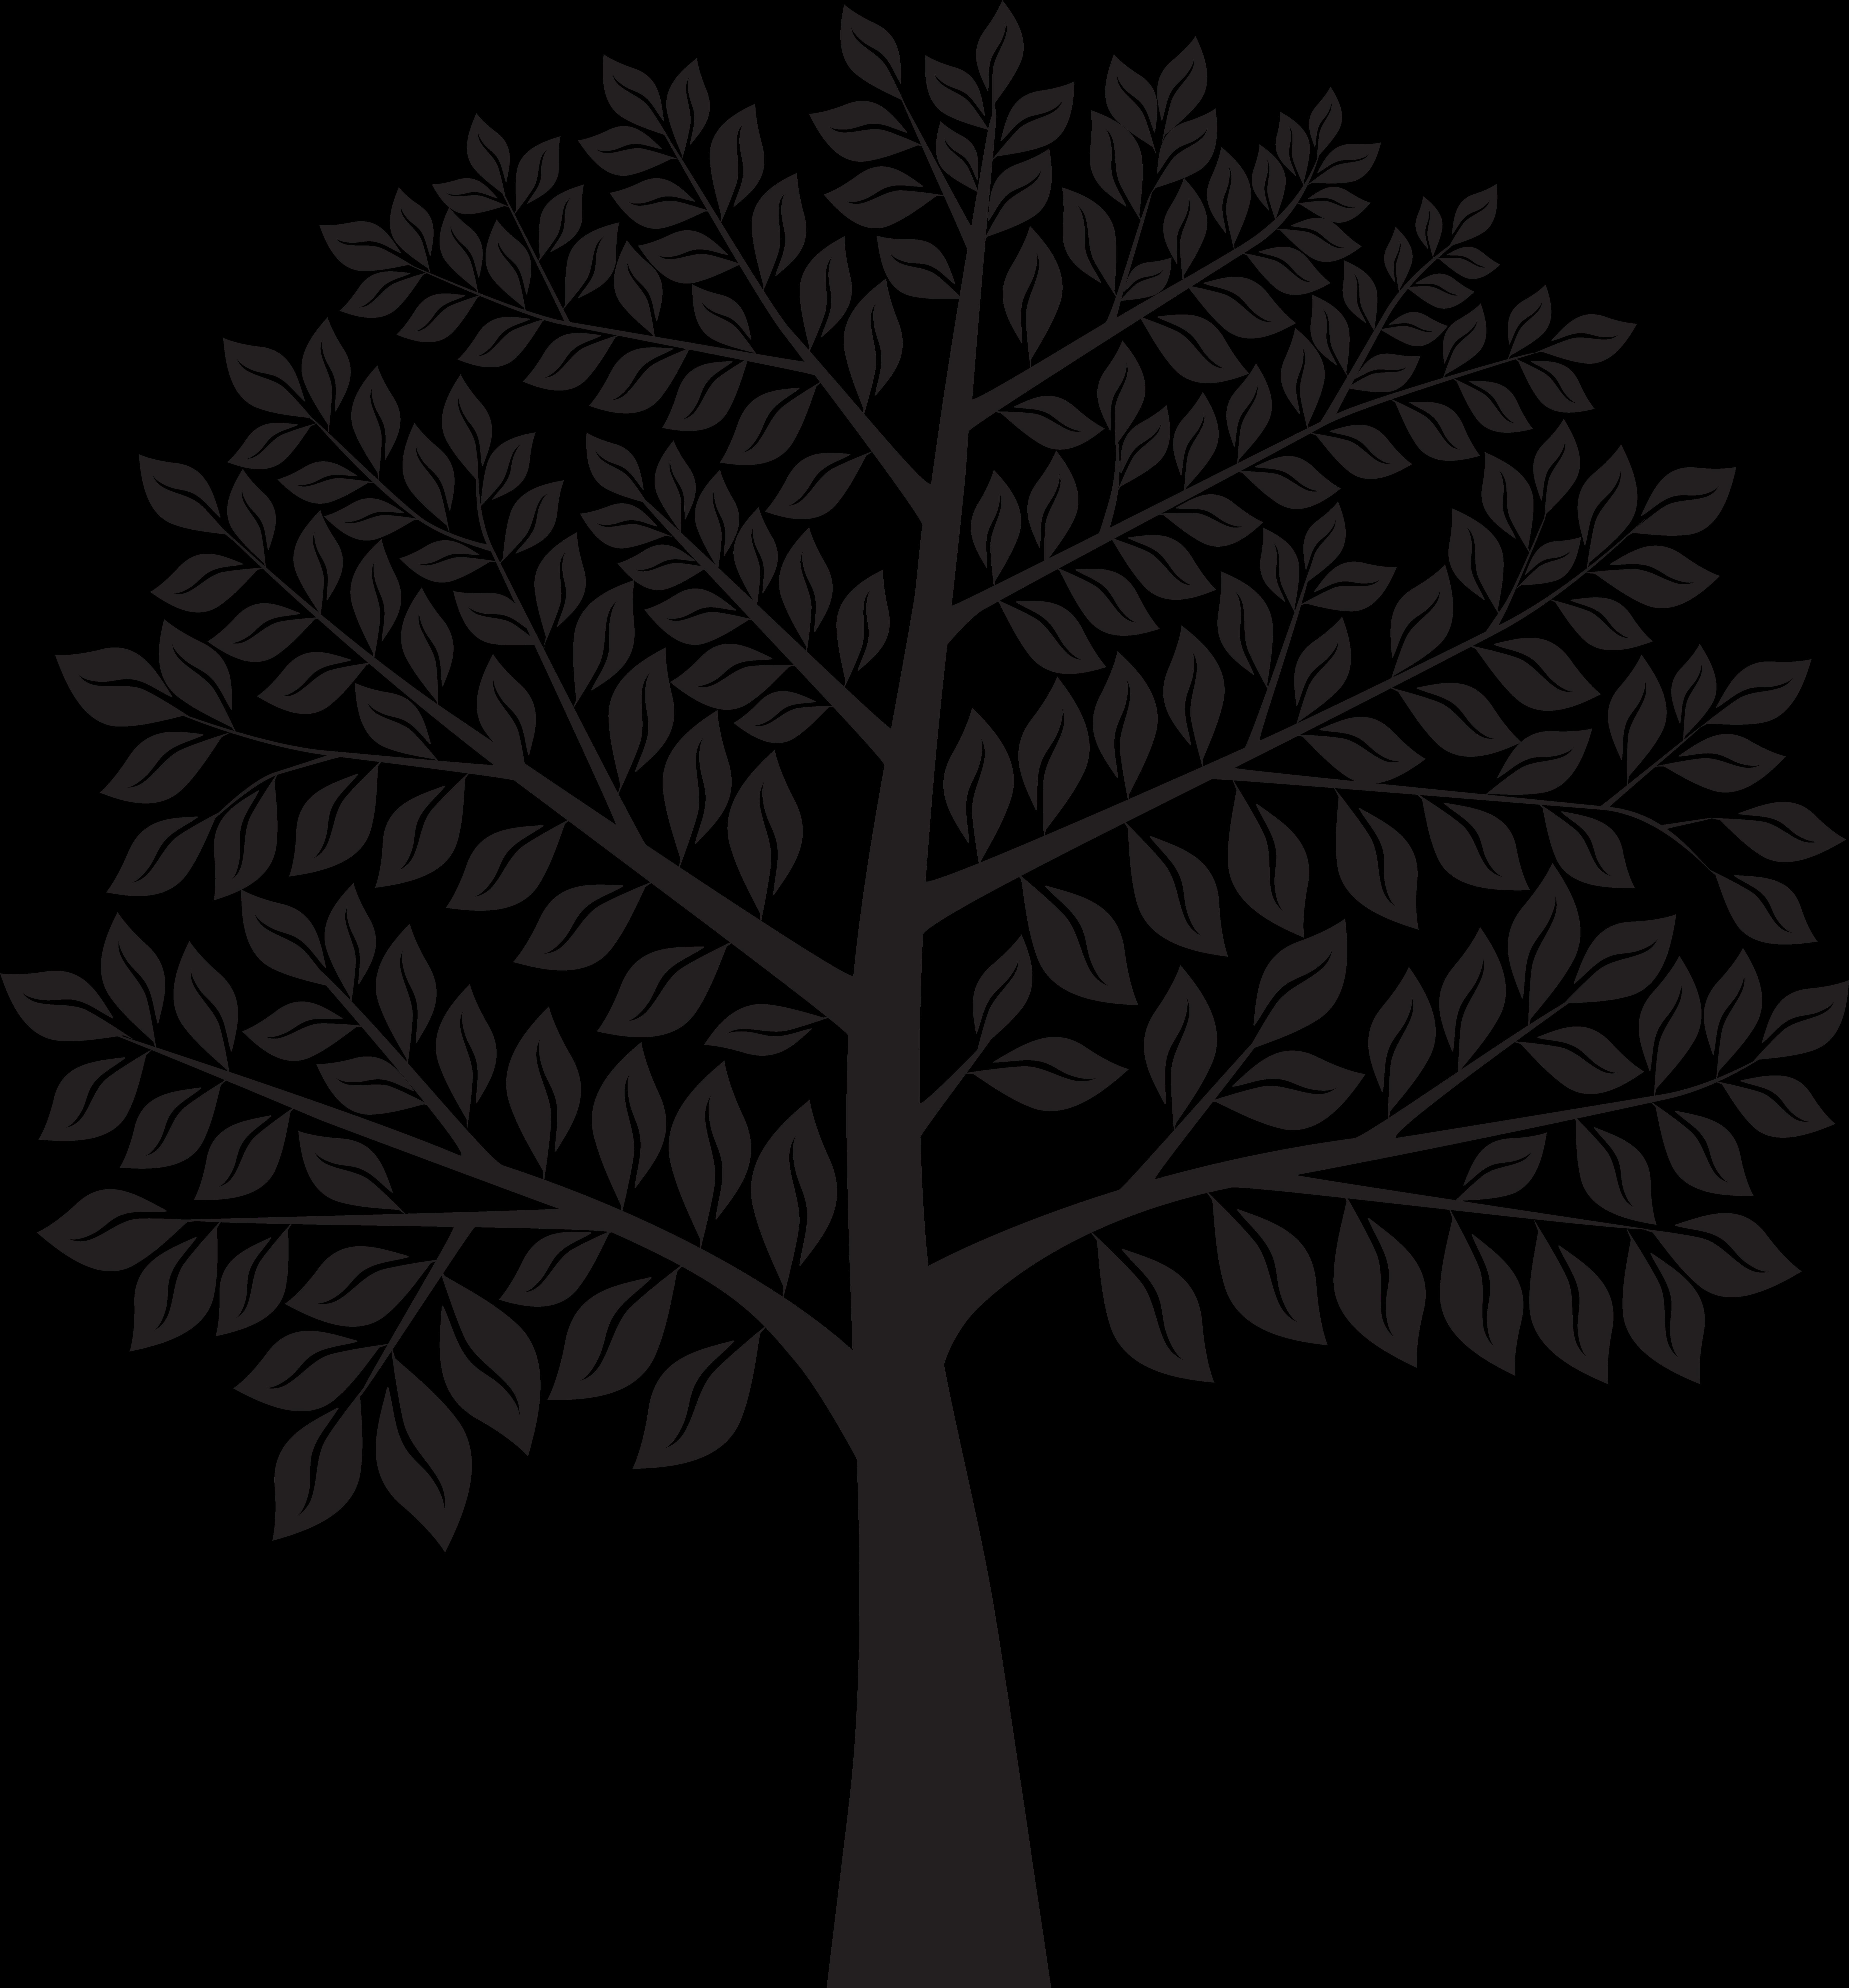 Grain clipart tree. Hd wheat silhouette transparent